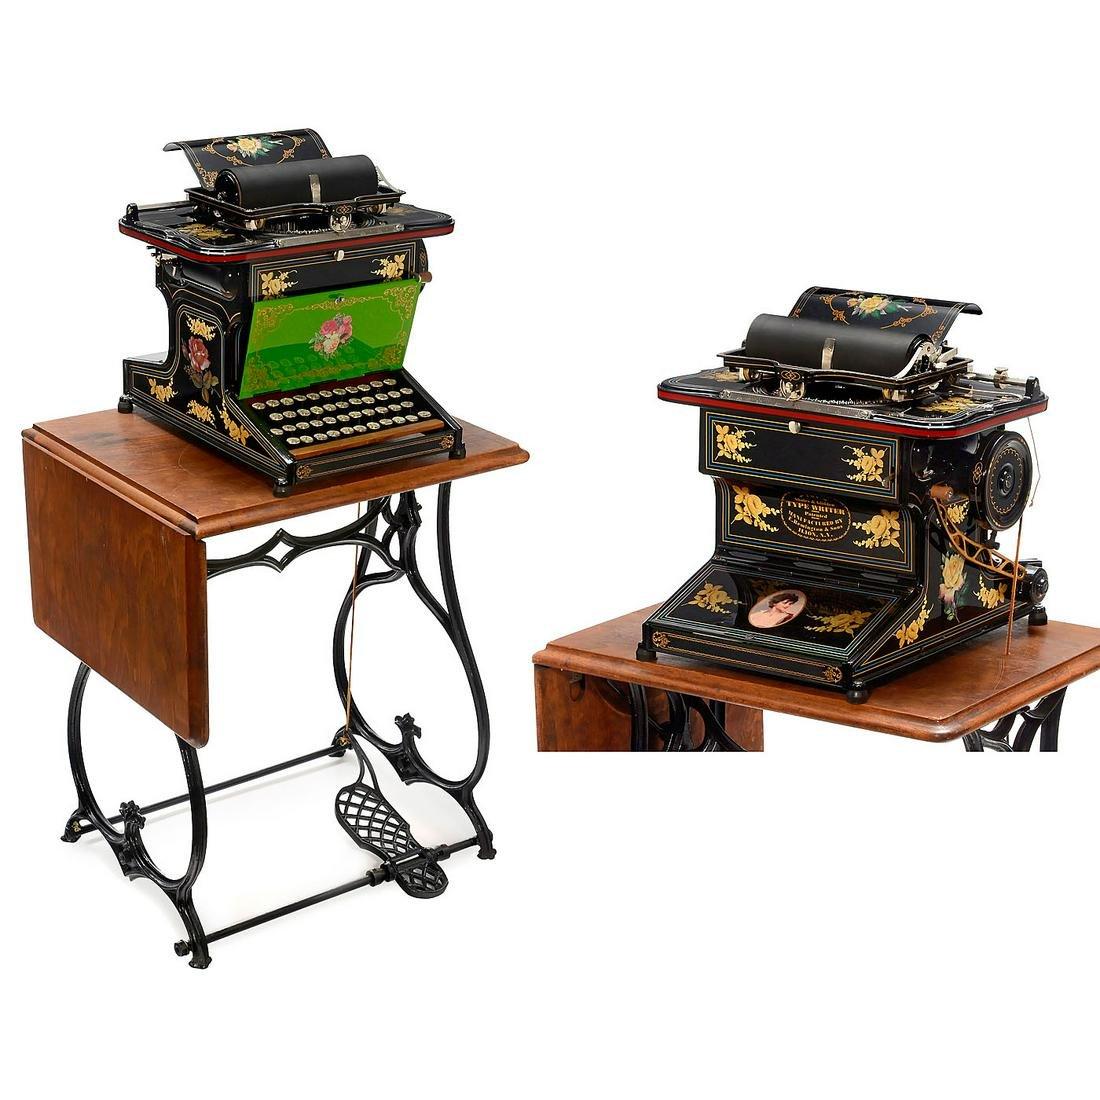 Sholes & Glidden Typewriter, 1873